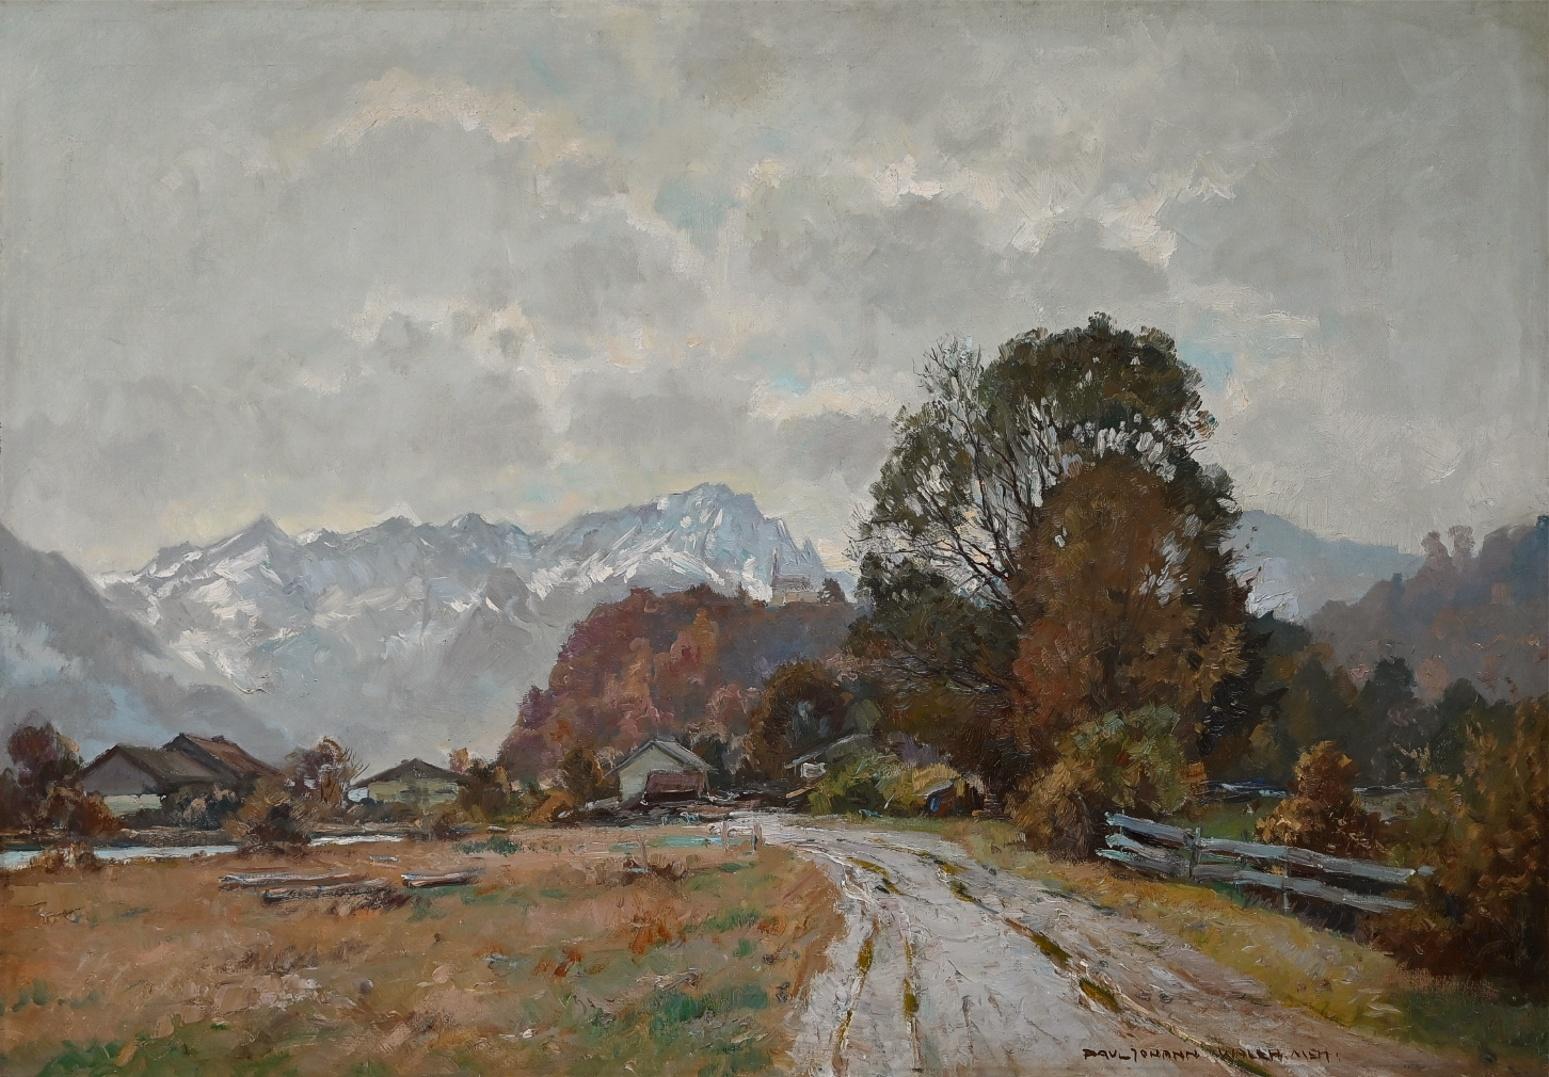 Paul Johann Walch (1881 - 1958) » Öl-Gemälde süddeutsche Malerei Münchner Malerschule